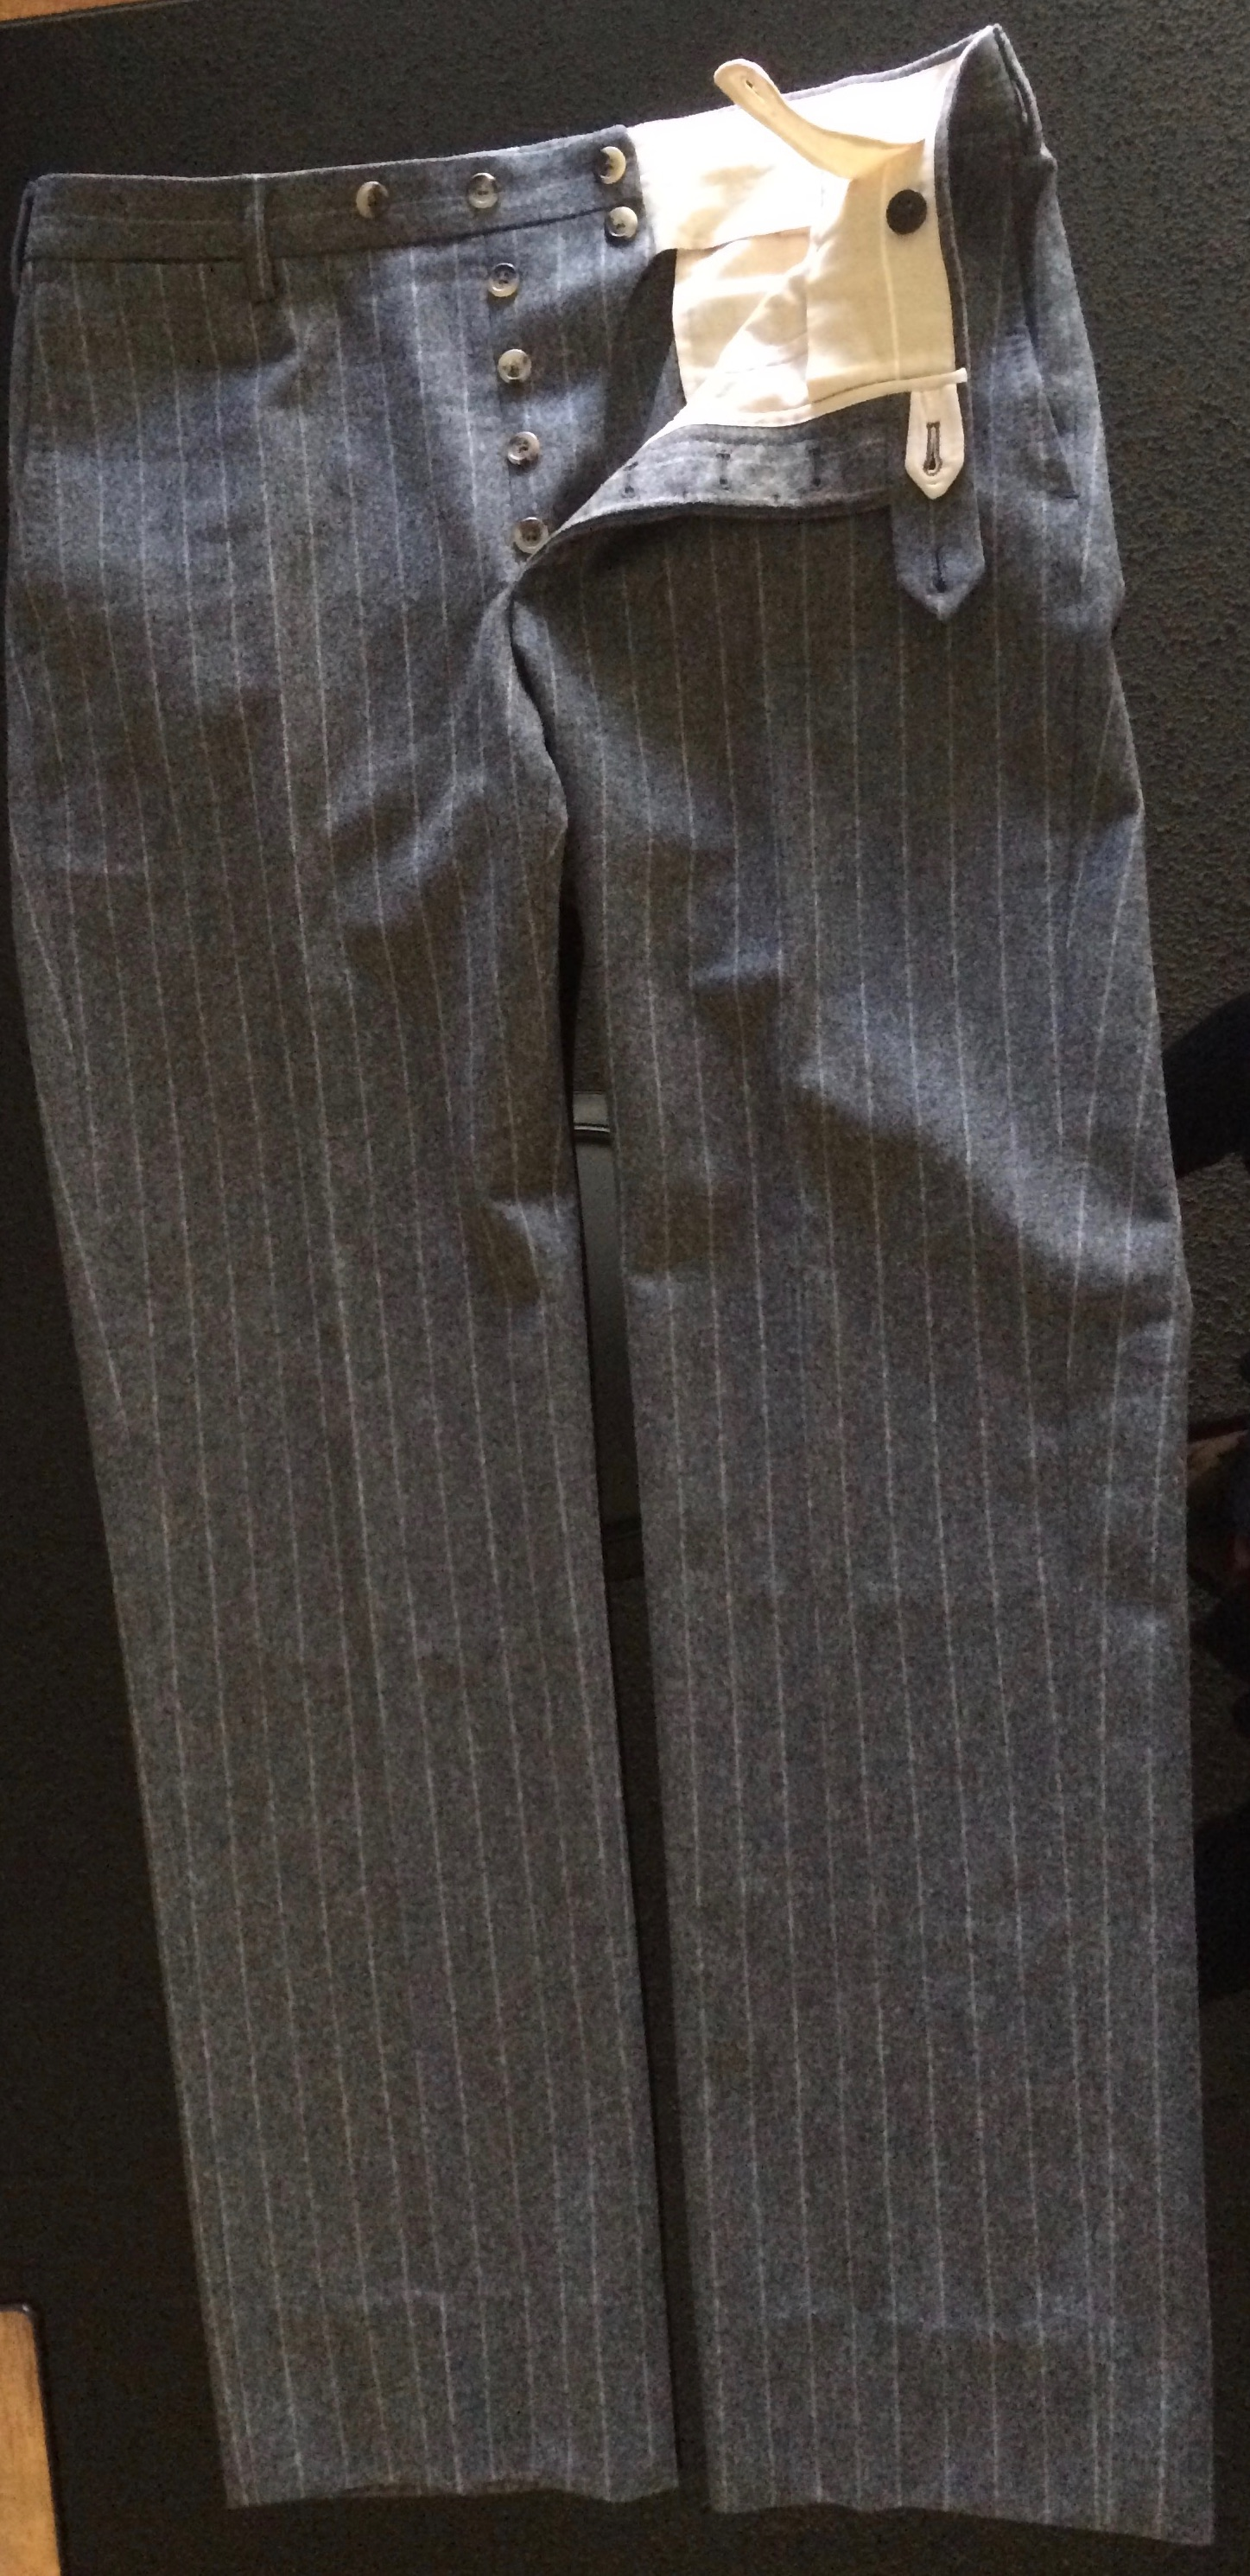 Sartoria Formosa trousers - no cuffs, flannel, button fly